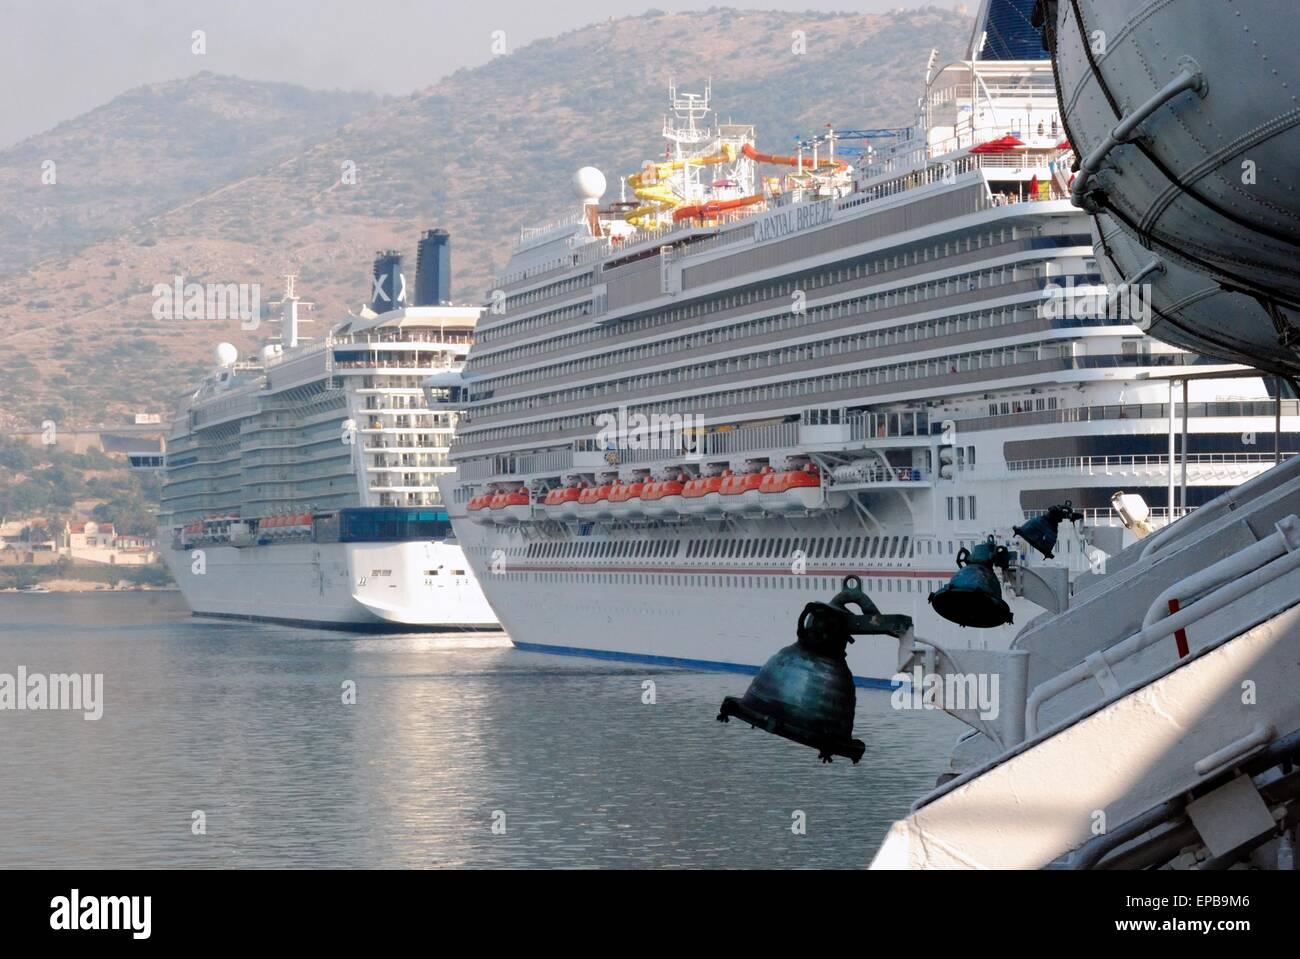 Cruise ships visits Dubrovnik, Croatia. - Stock Image